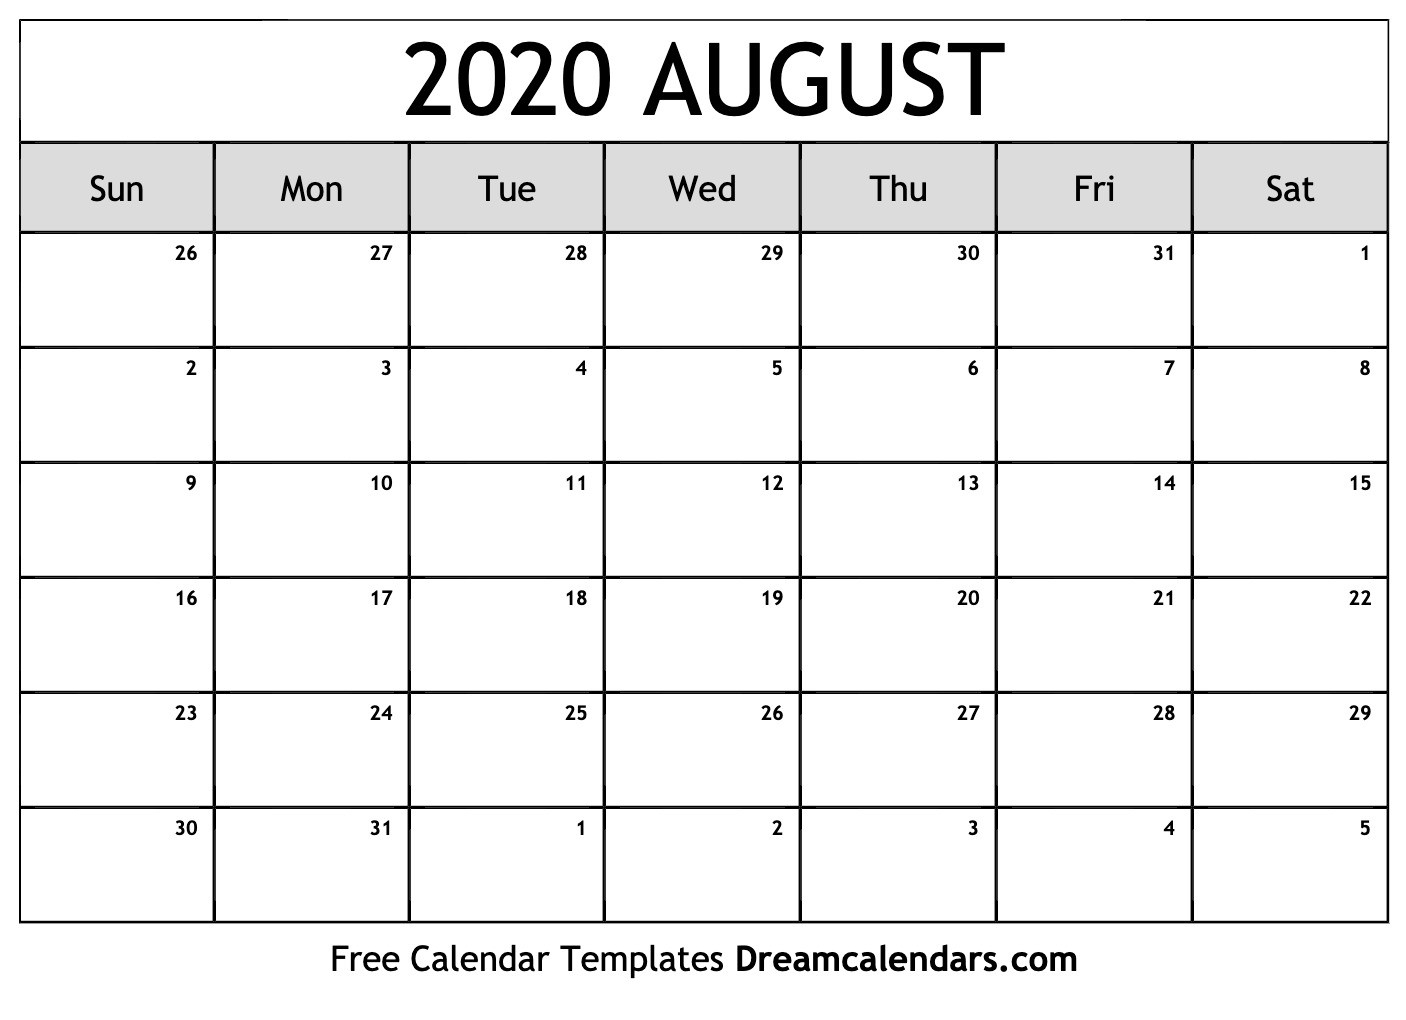 Printable August 2020 Calendar-Calendar Template Fill In Aug 2020